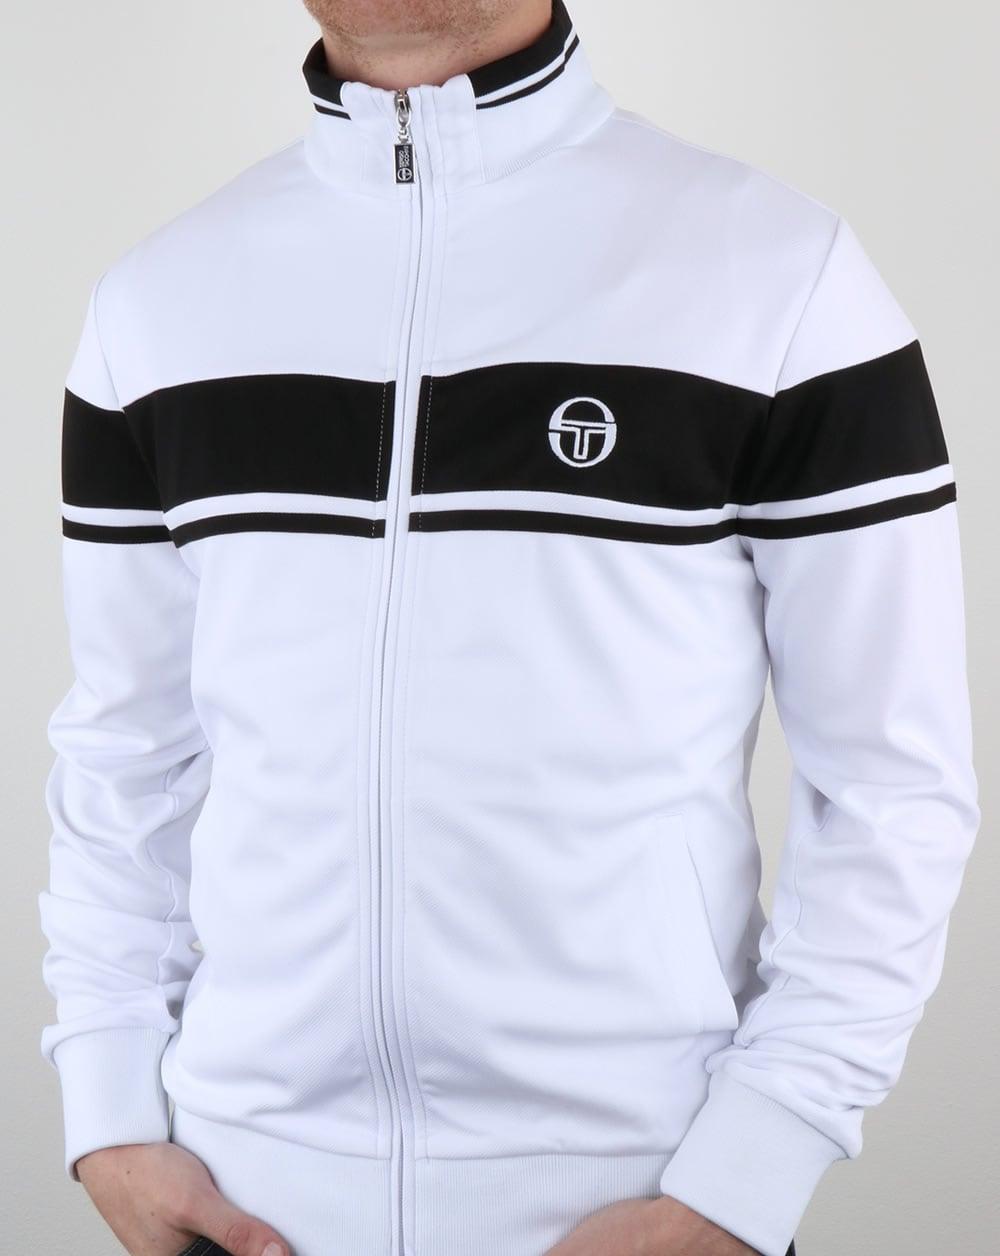 4edb85d14d Sergio Tacchini Masters Track Top White/Black,tracksuit,jacket